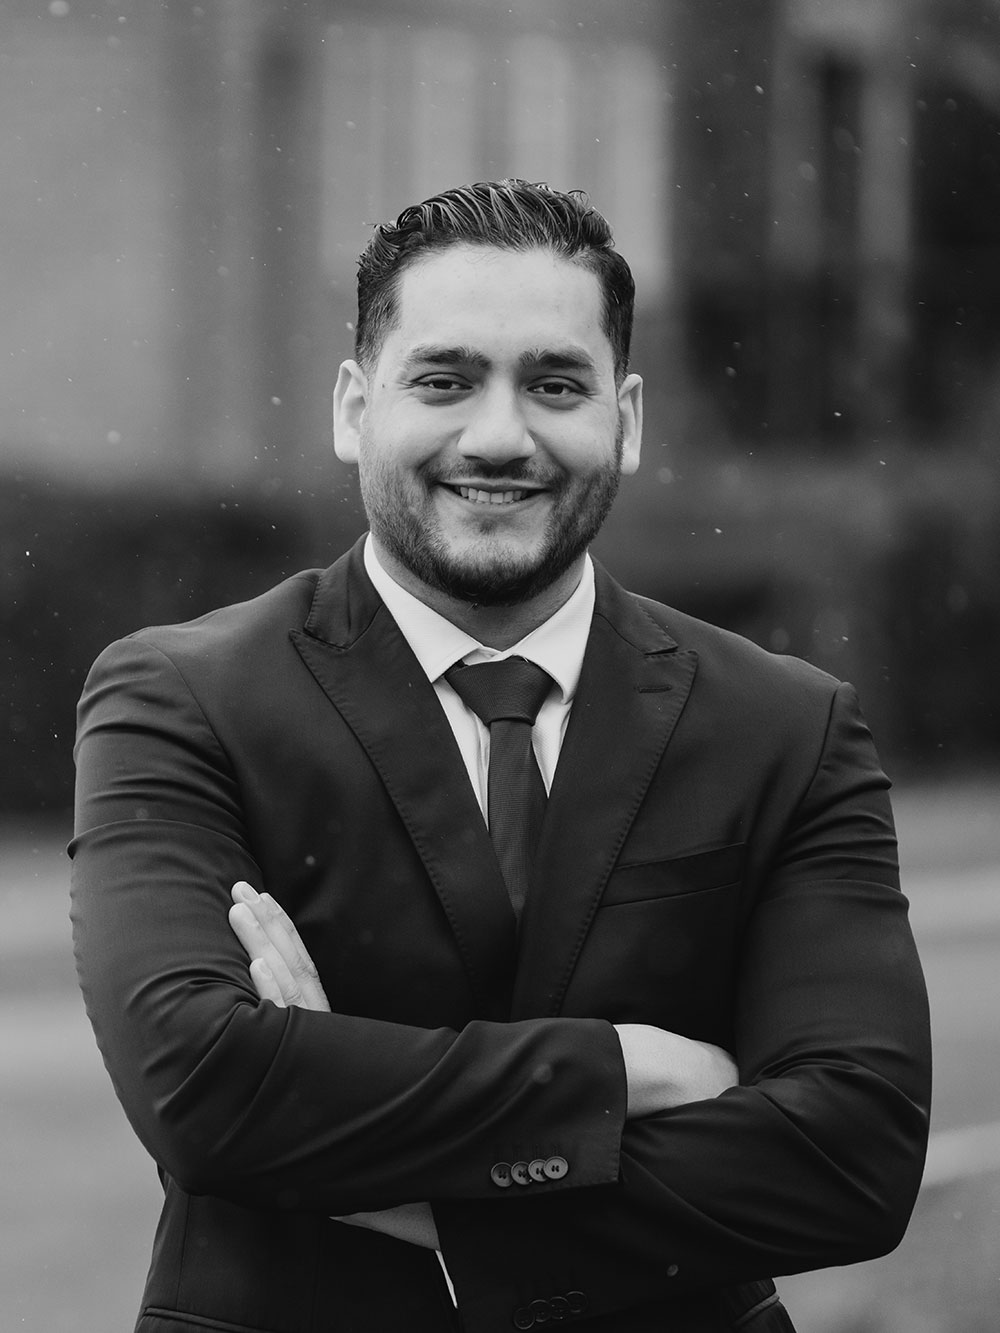 Adeel Ali portrait photography smiling